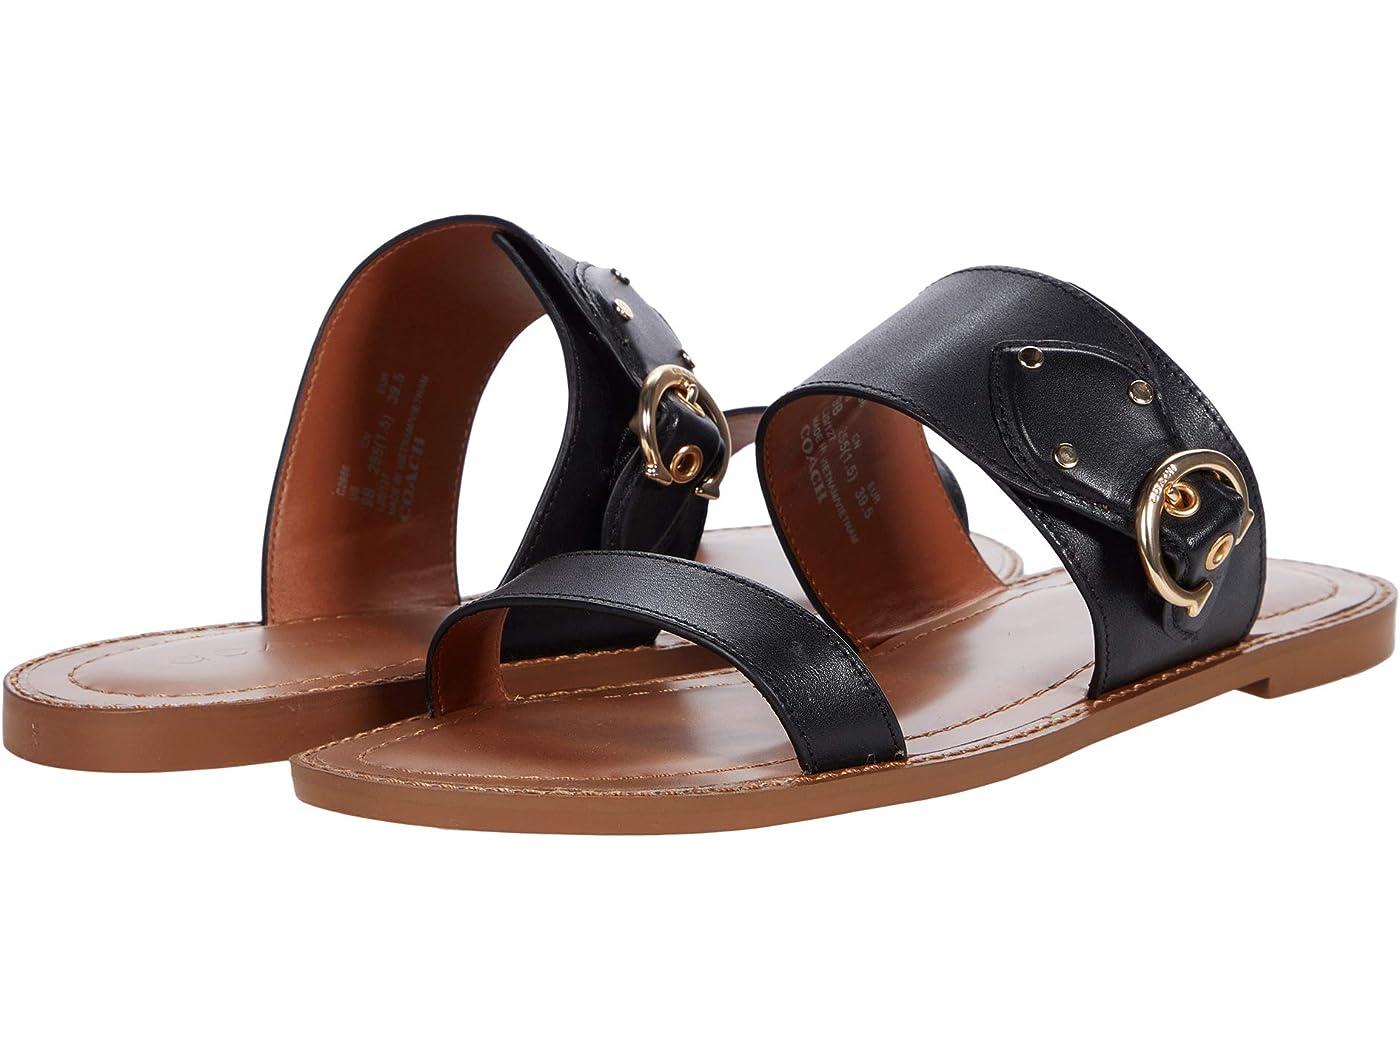 COACH Harlow Sandal